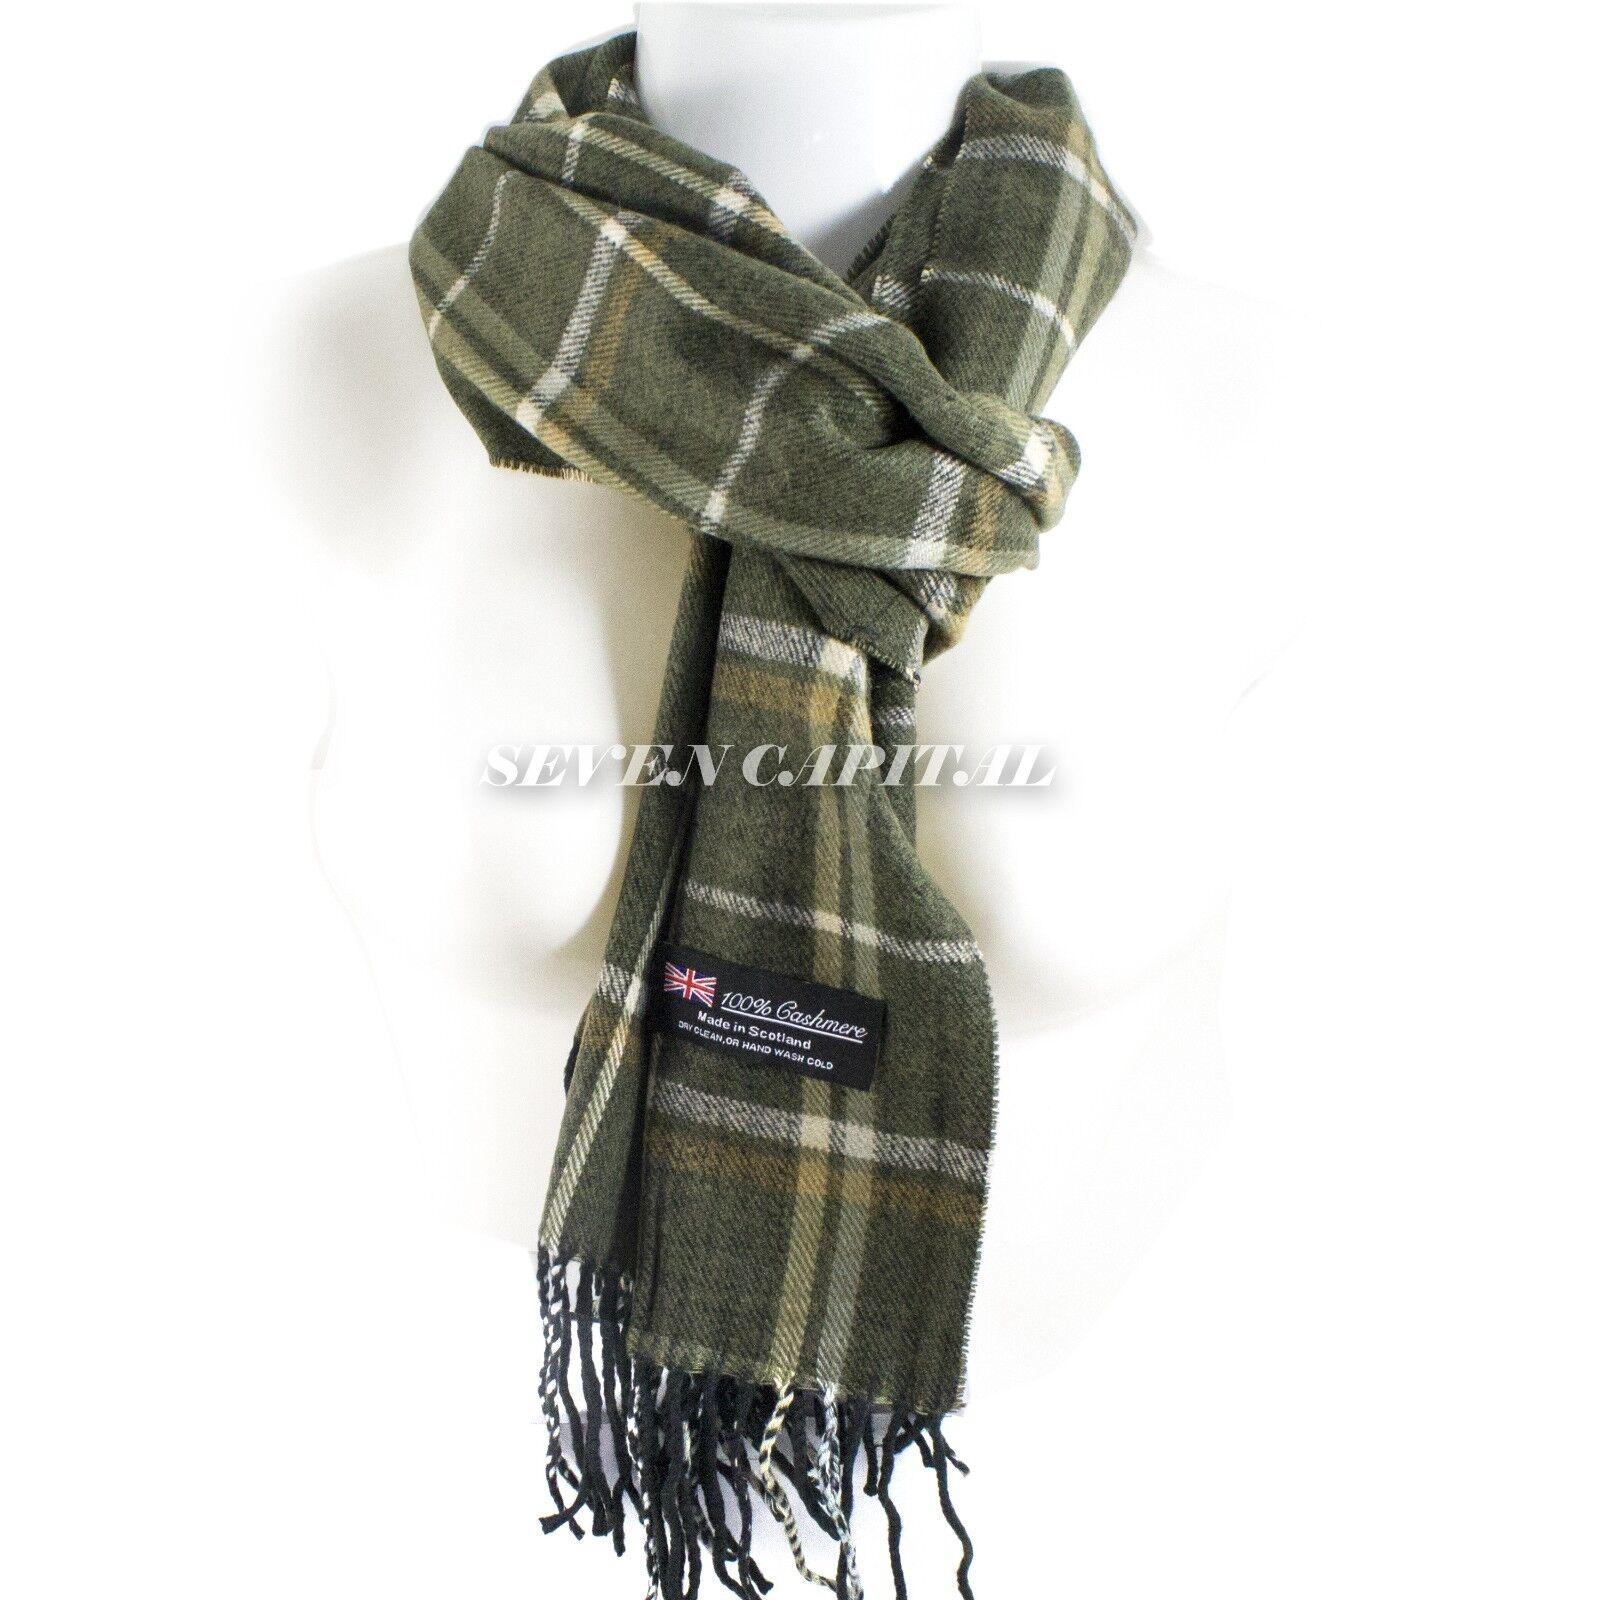 Mens Womens Winter Warm SCOTLAND Made 100% CASHMERE Scarf Scarves Plaid Wool 13. Plaid: Dark Green/White/ Black